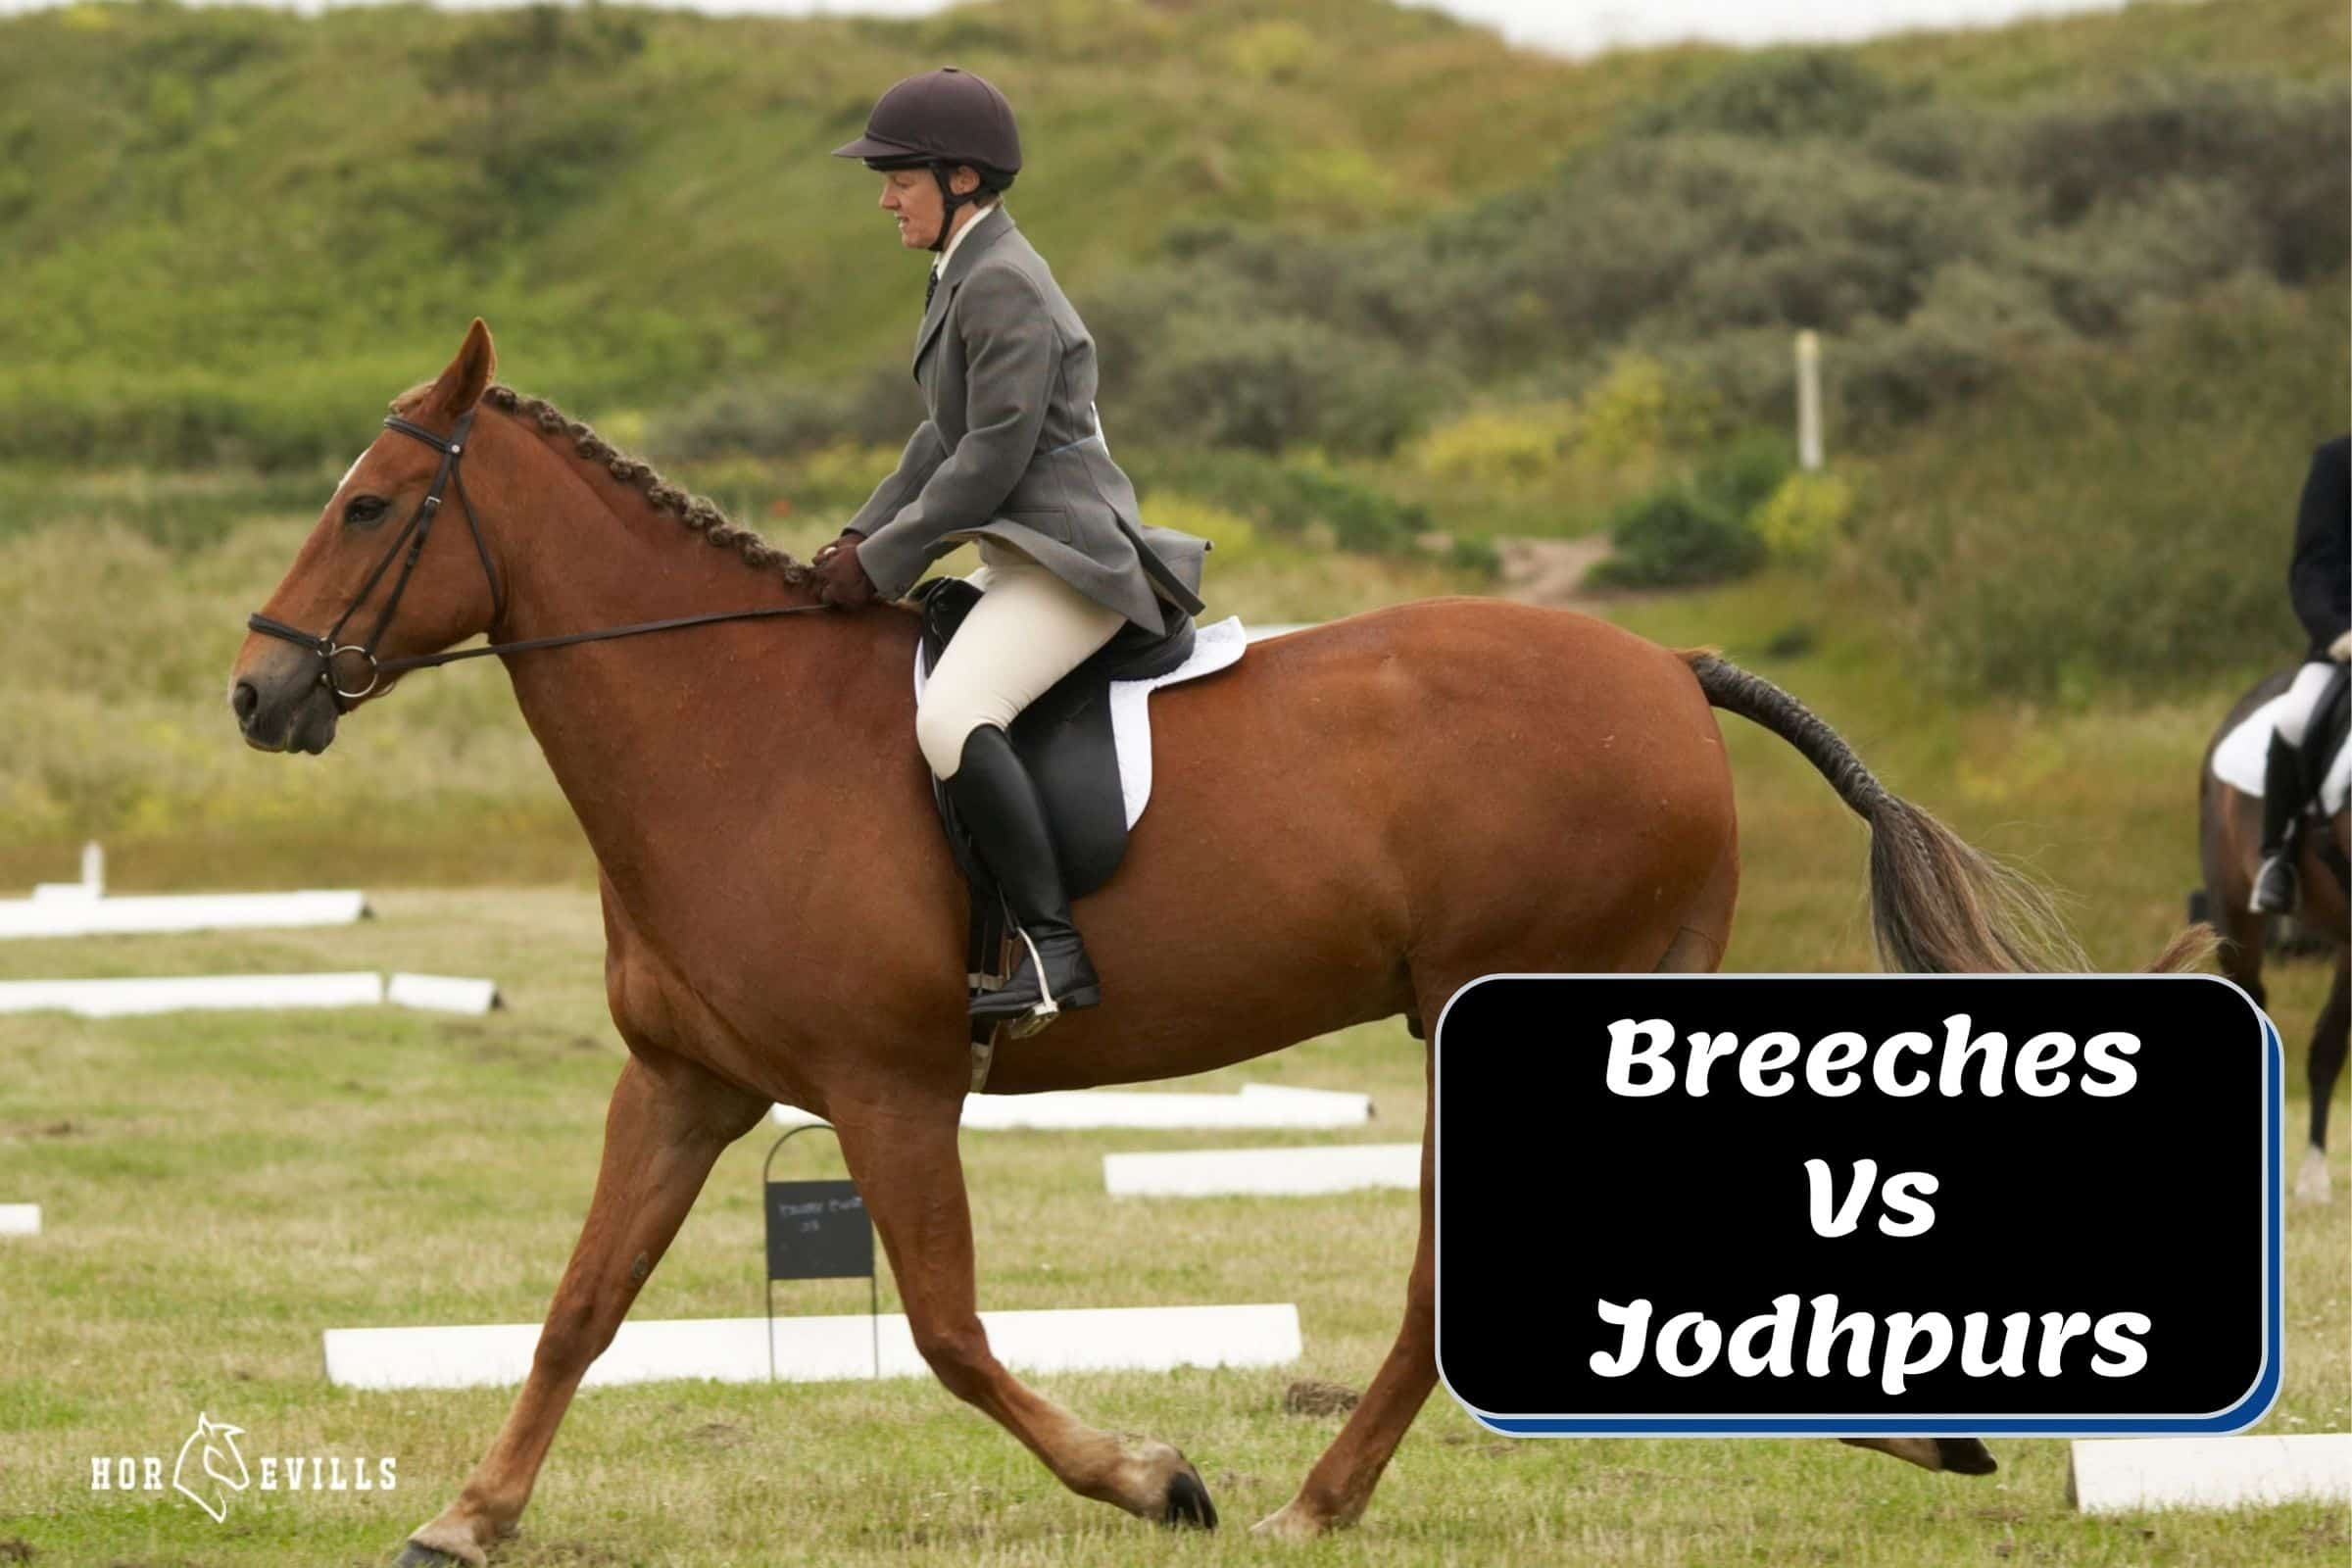 woman wearing pale cream jodhpurs while riding a brown horse: Breeches Vs Jodhpurs